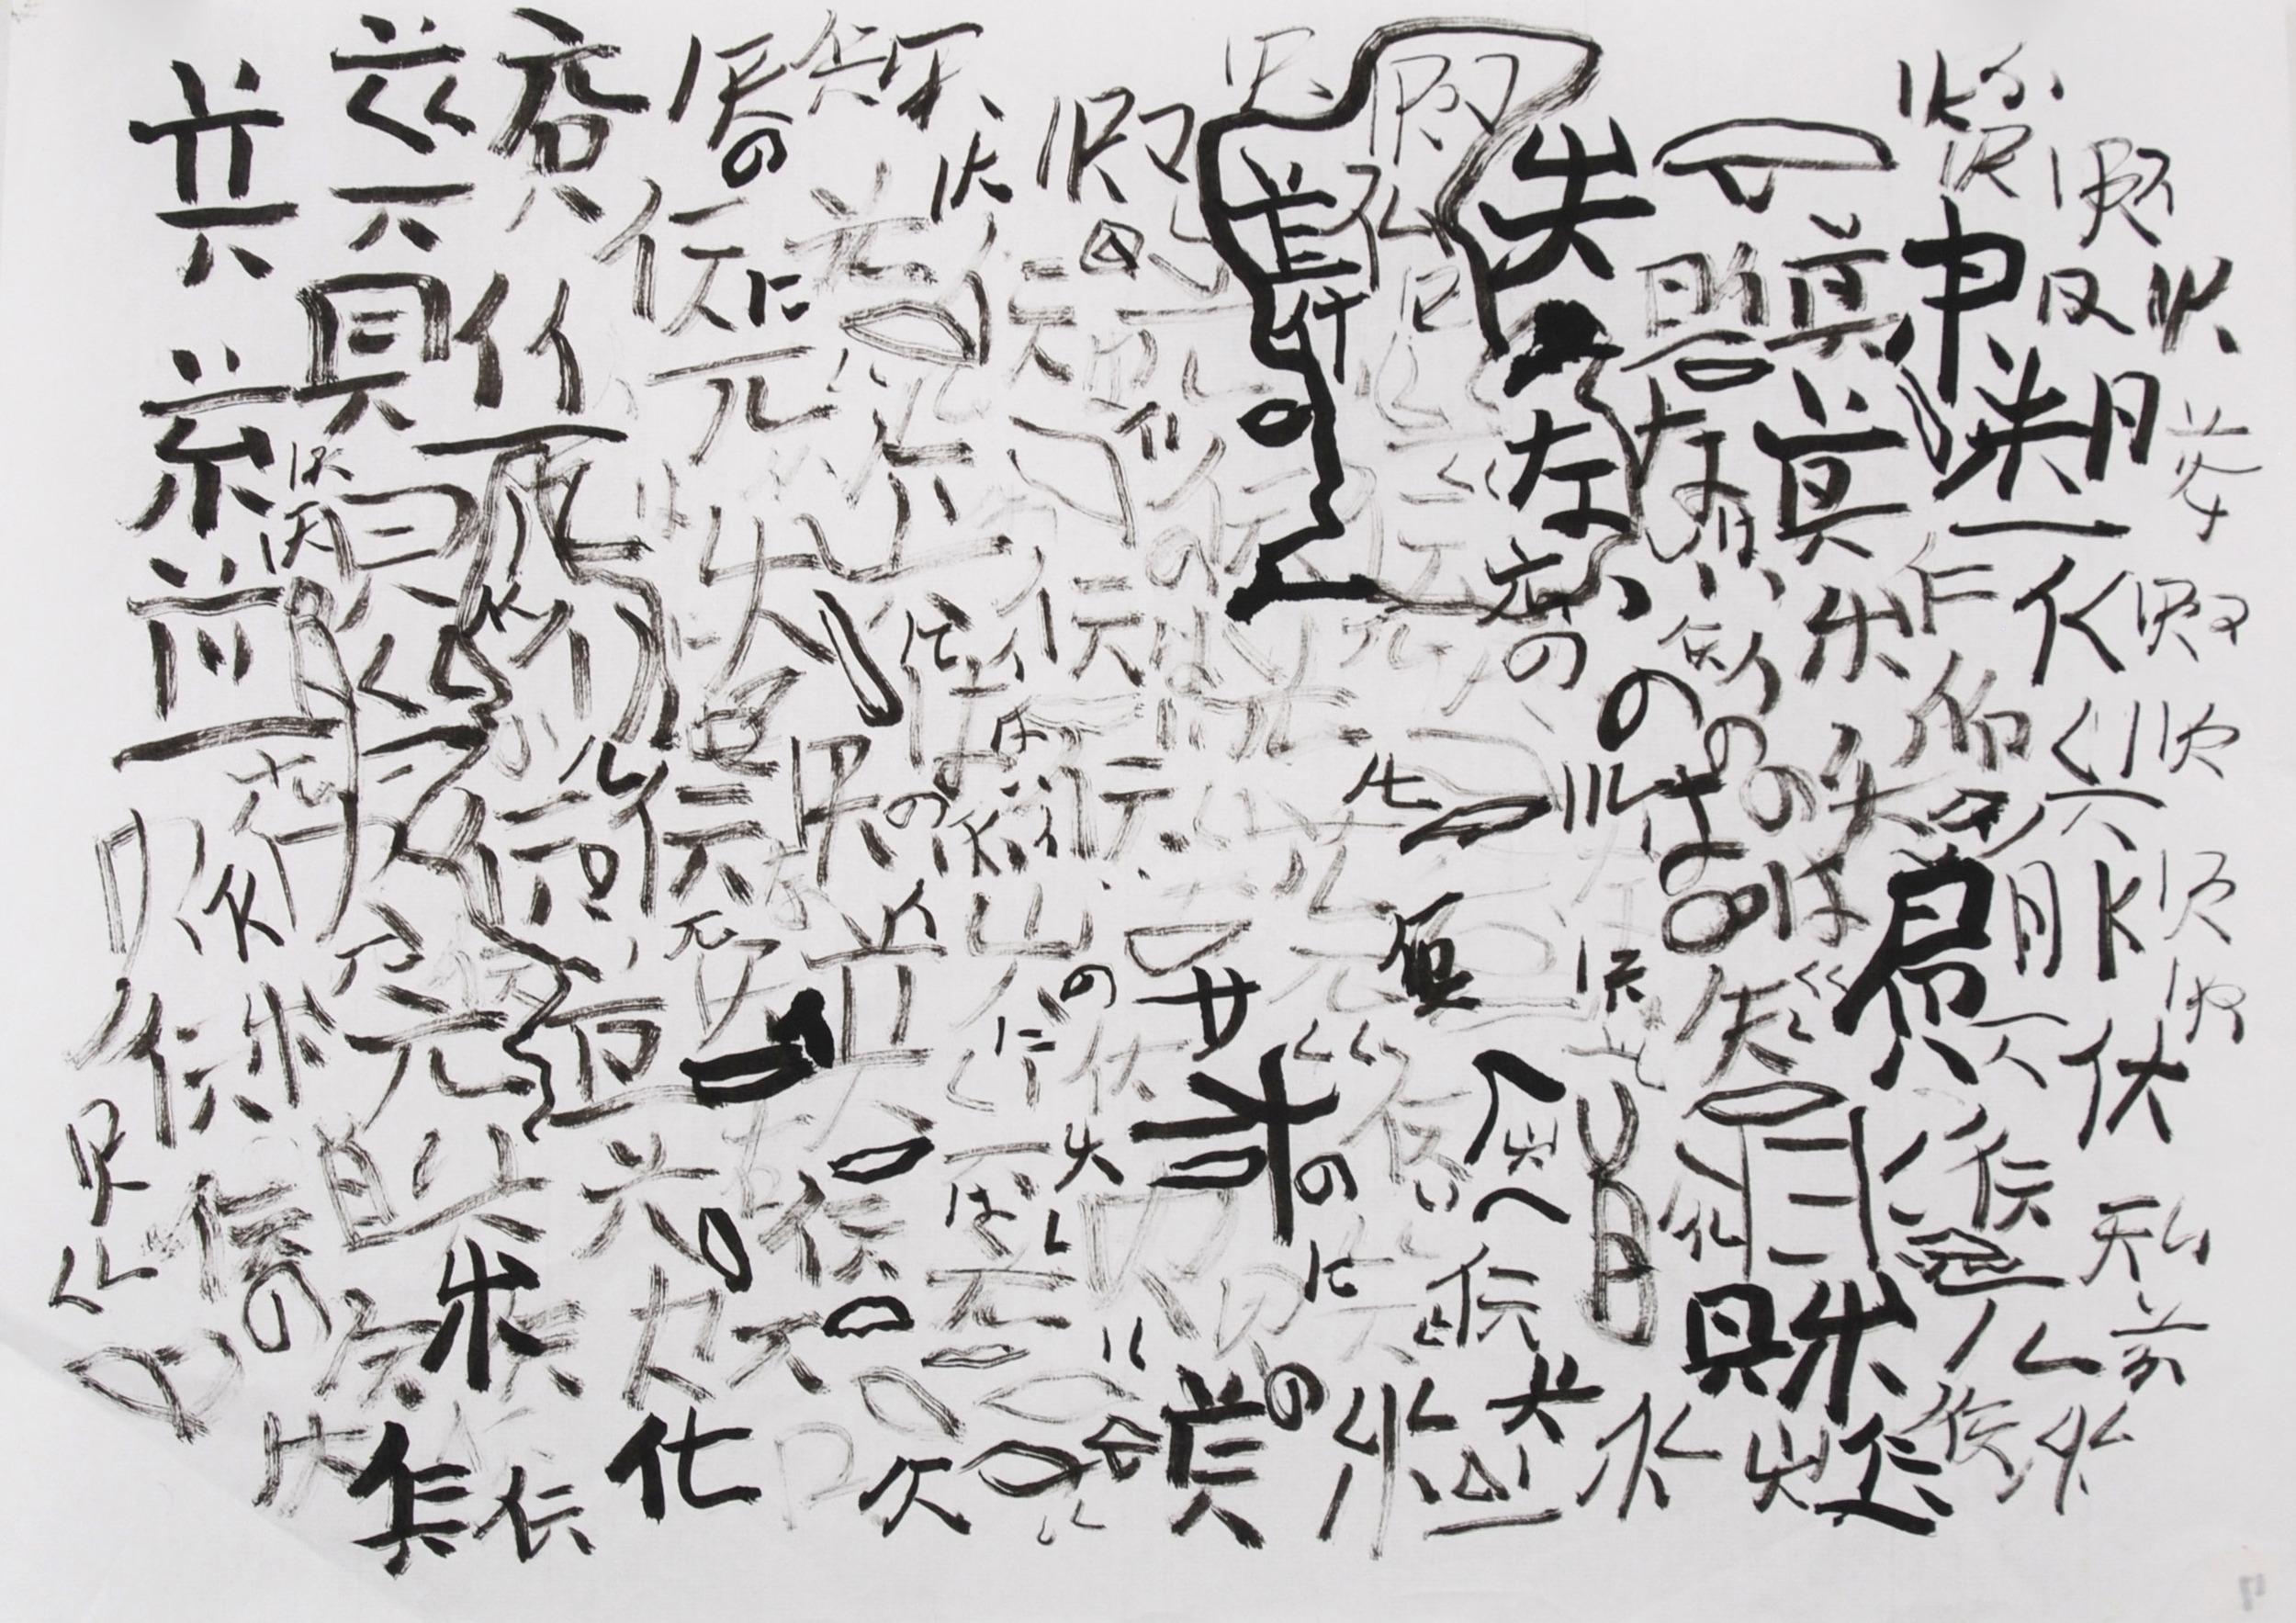 Hiroe Kittaka    Untitled  , 2007 Ink, rice paper 9.5 x 13 inches / 24.1 x 33 cm / HKi 20